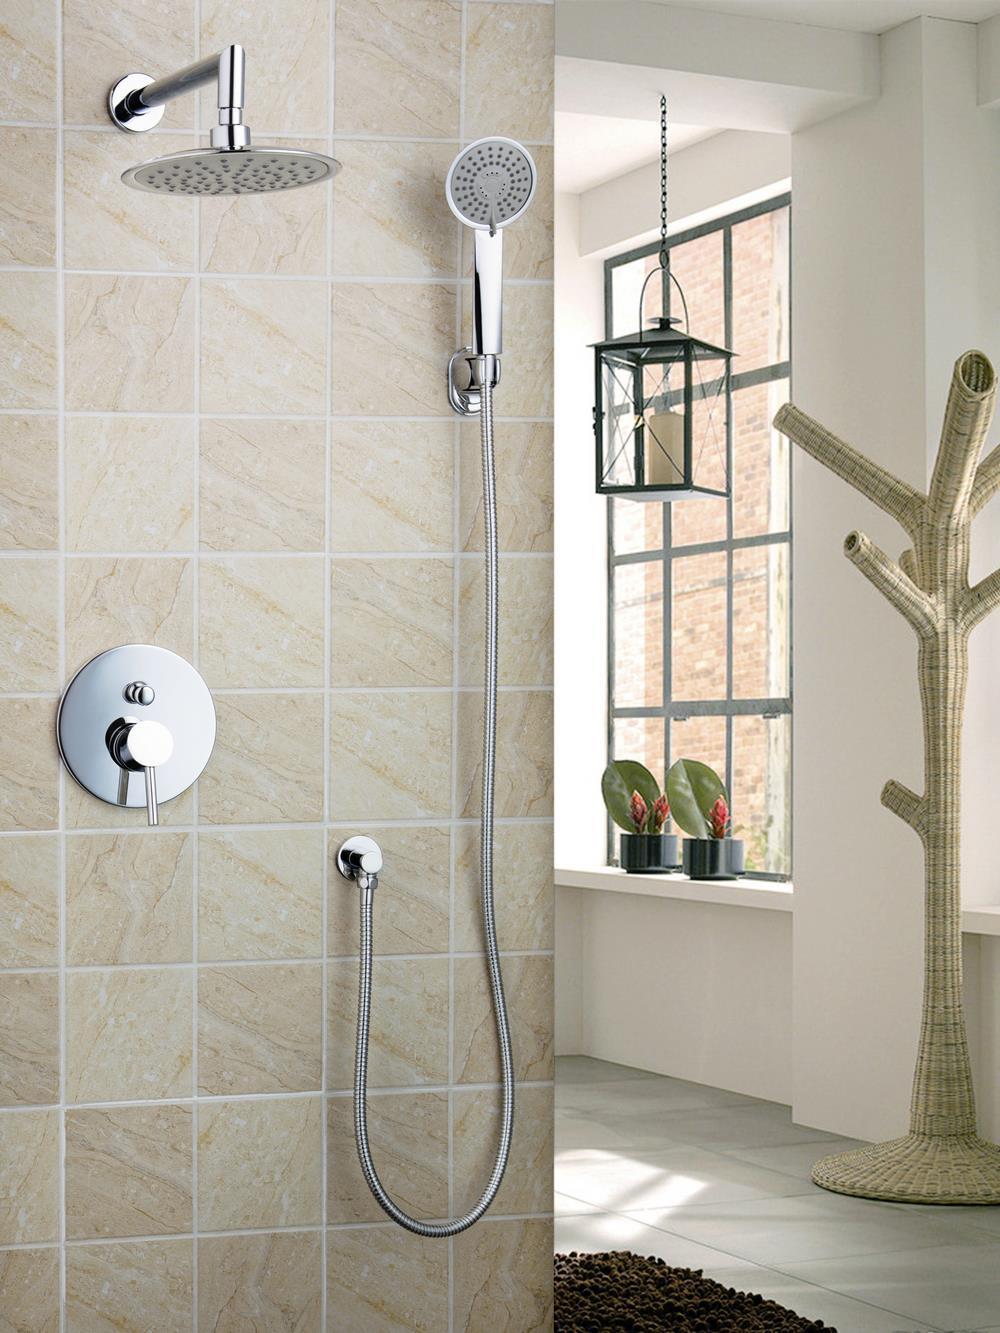 "Shower Set Torneira 50236-42A LED Light 8"" Rainfall Shower Head Arm Control Valve Handspray Shower Faucet Set Mixer Tap Faucet(China (Mainland))"